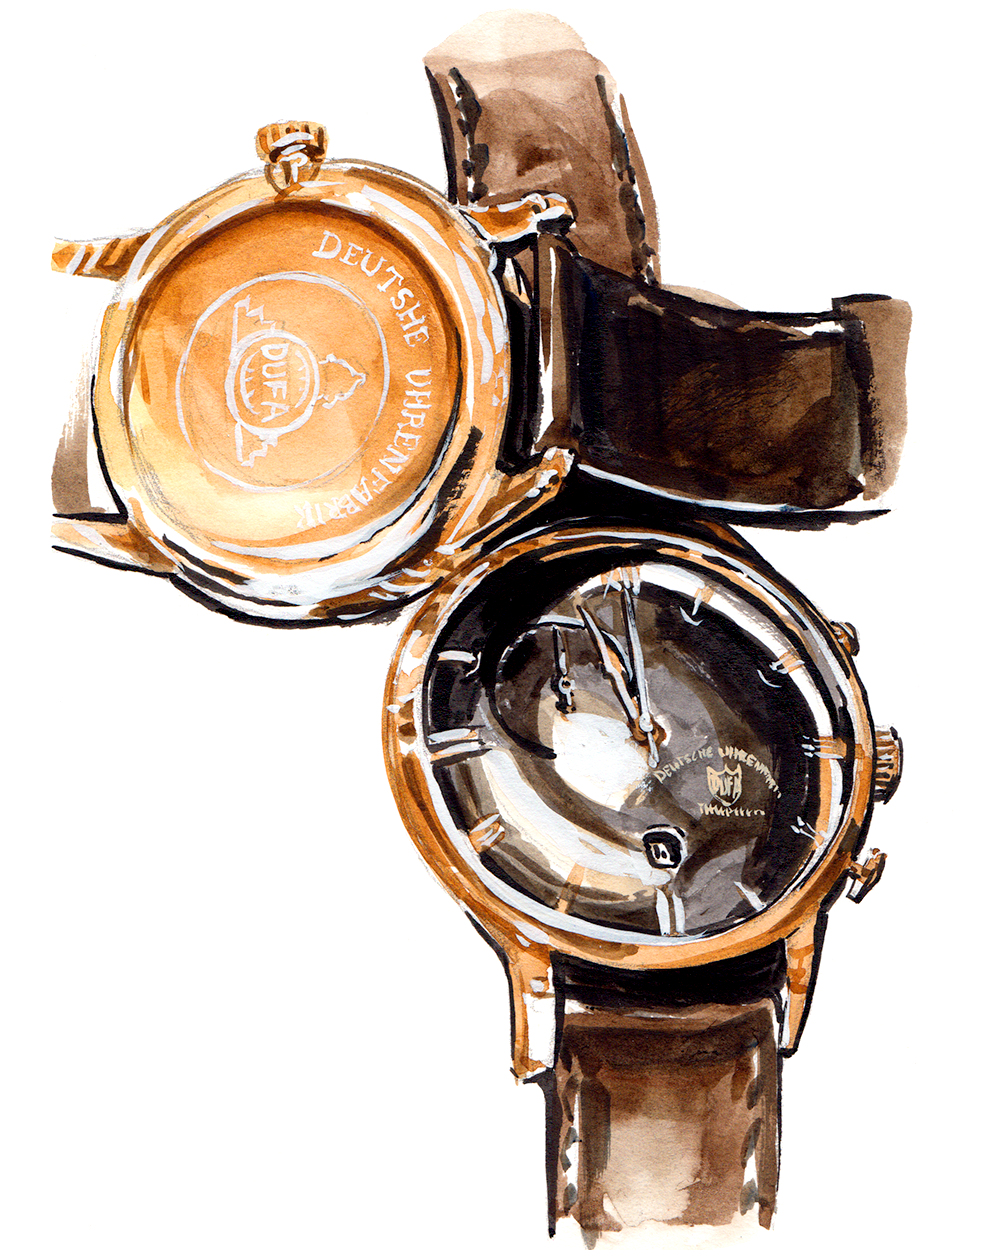 DuFa Watches